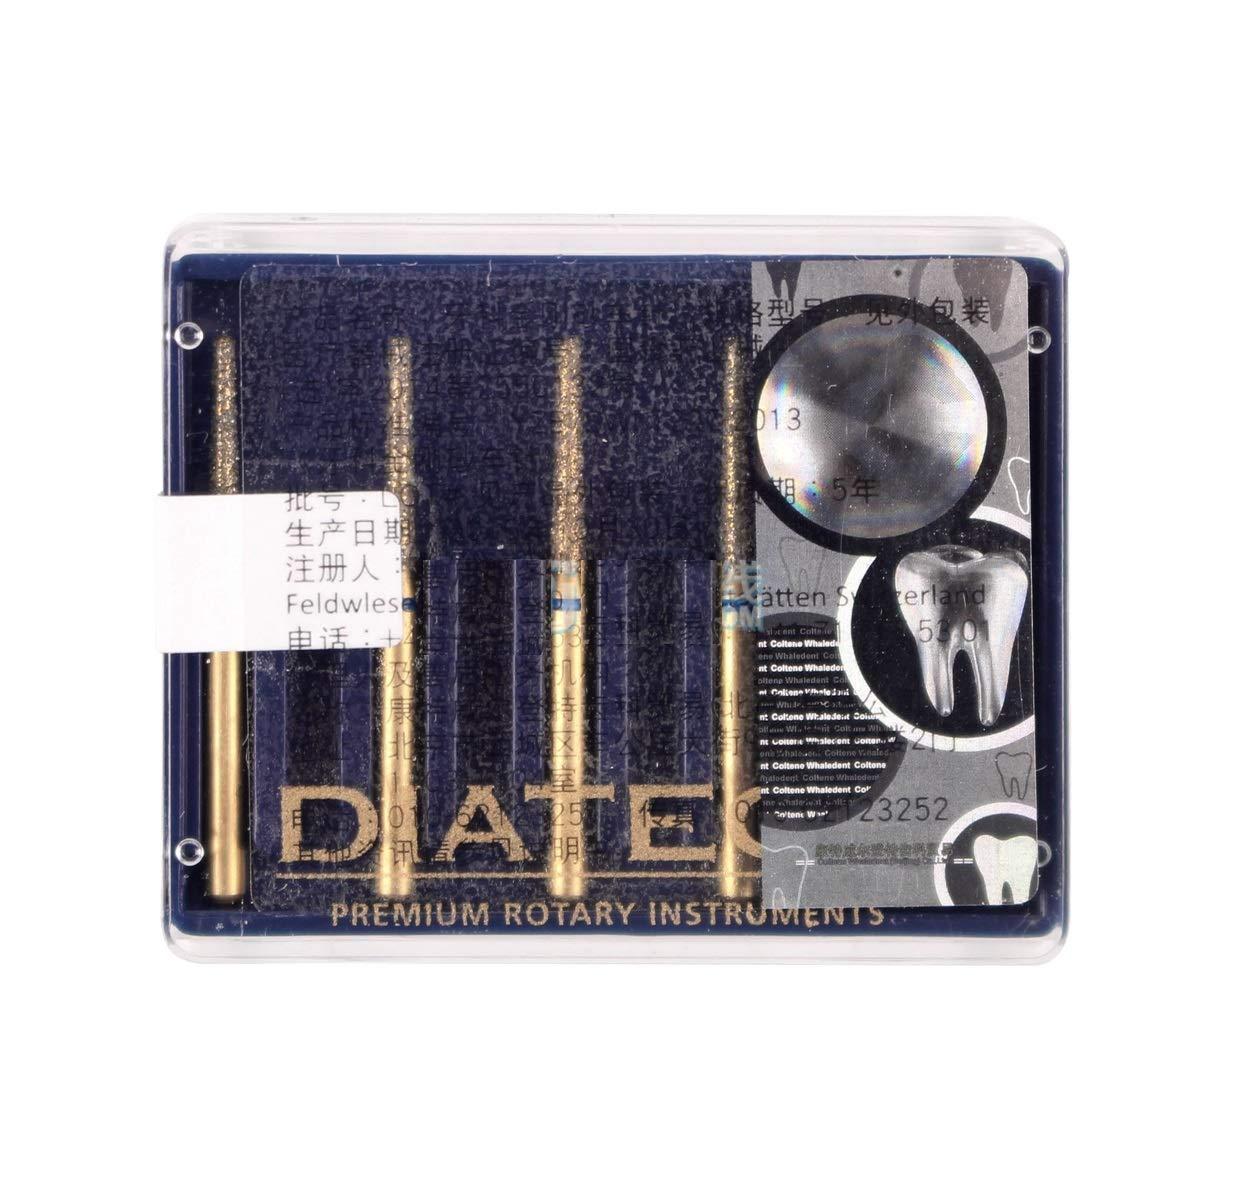 Dental COLTENE Diatech carborundum needle kit 856-014-9ML